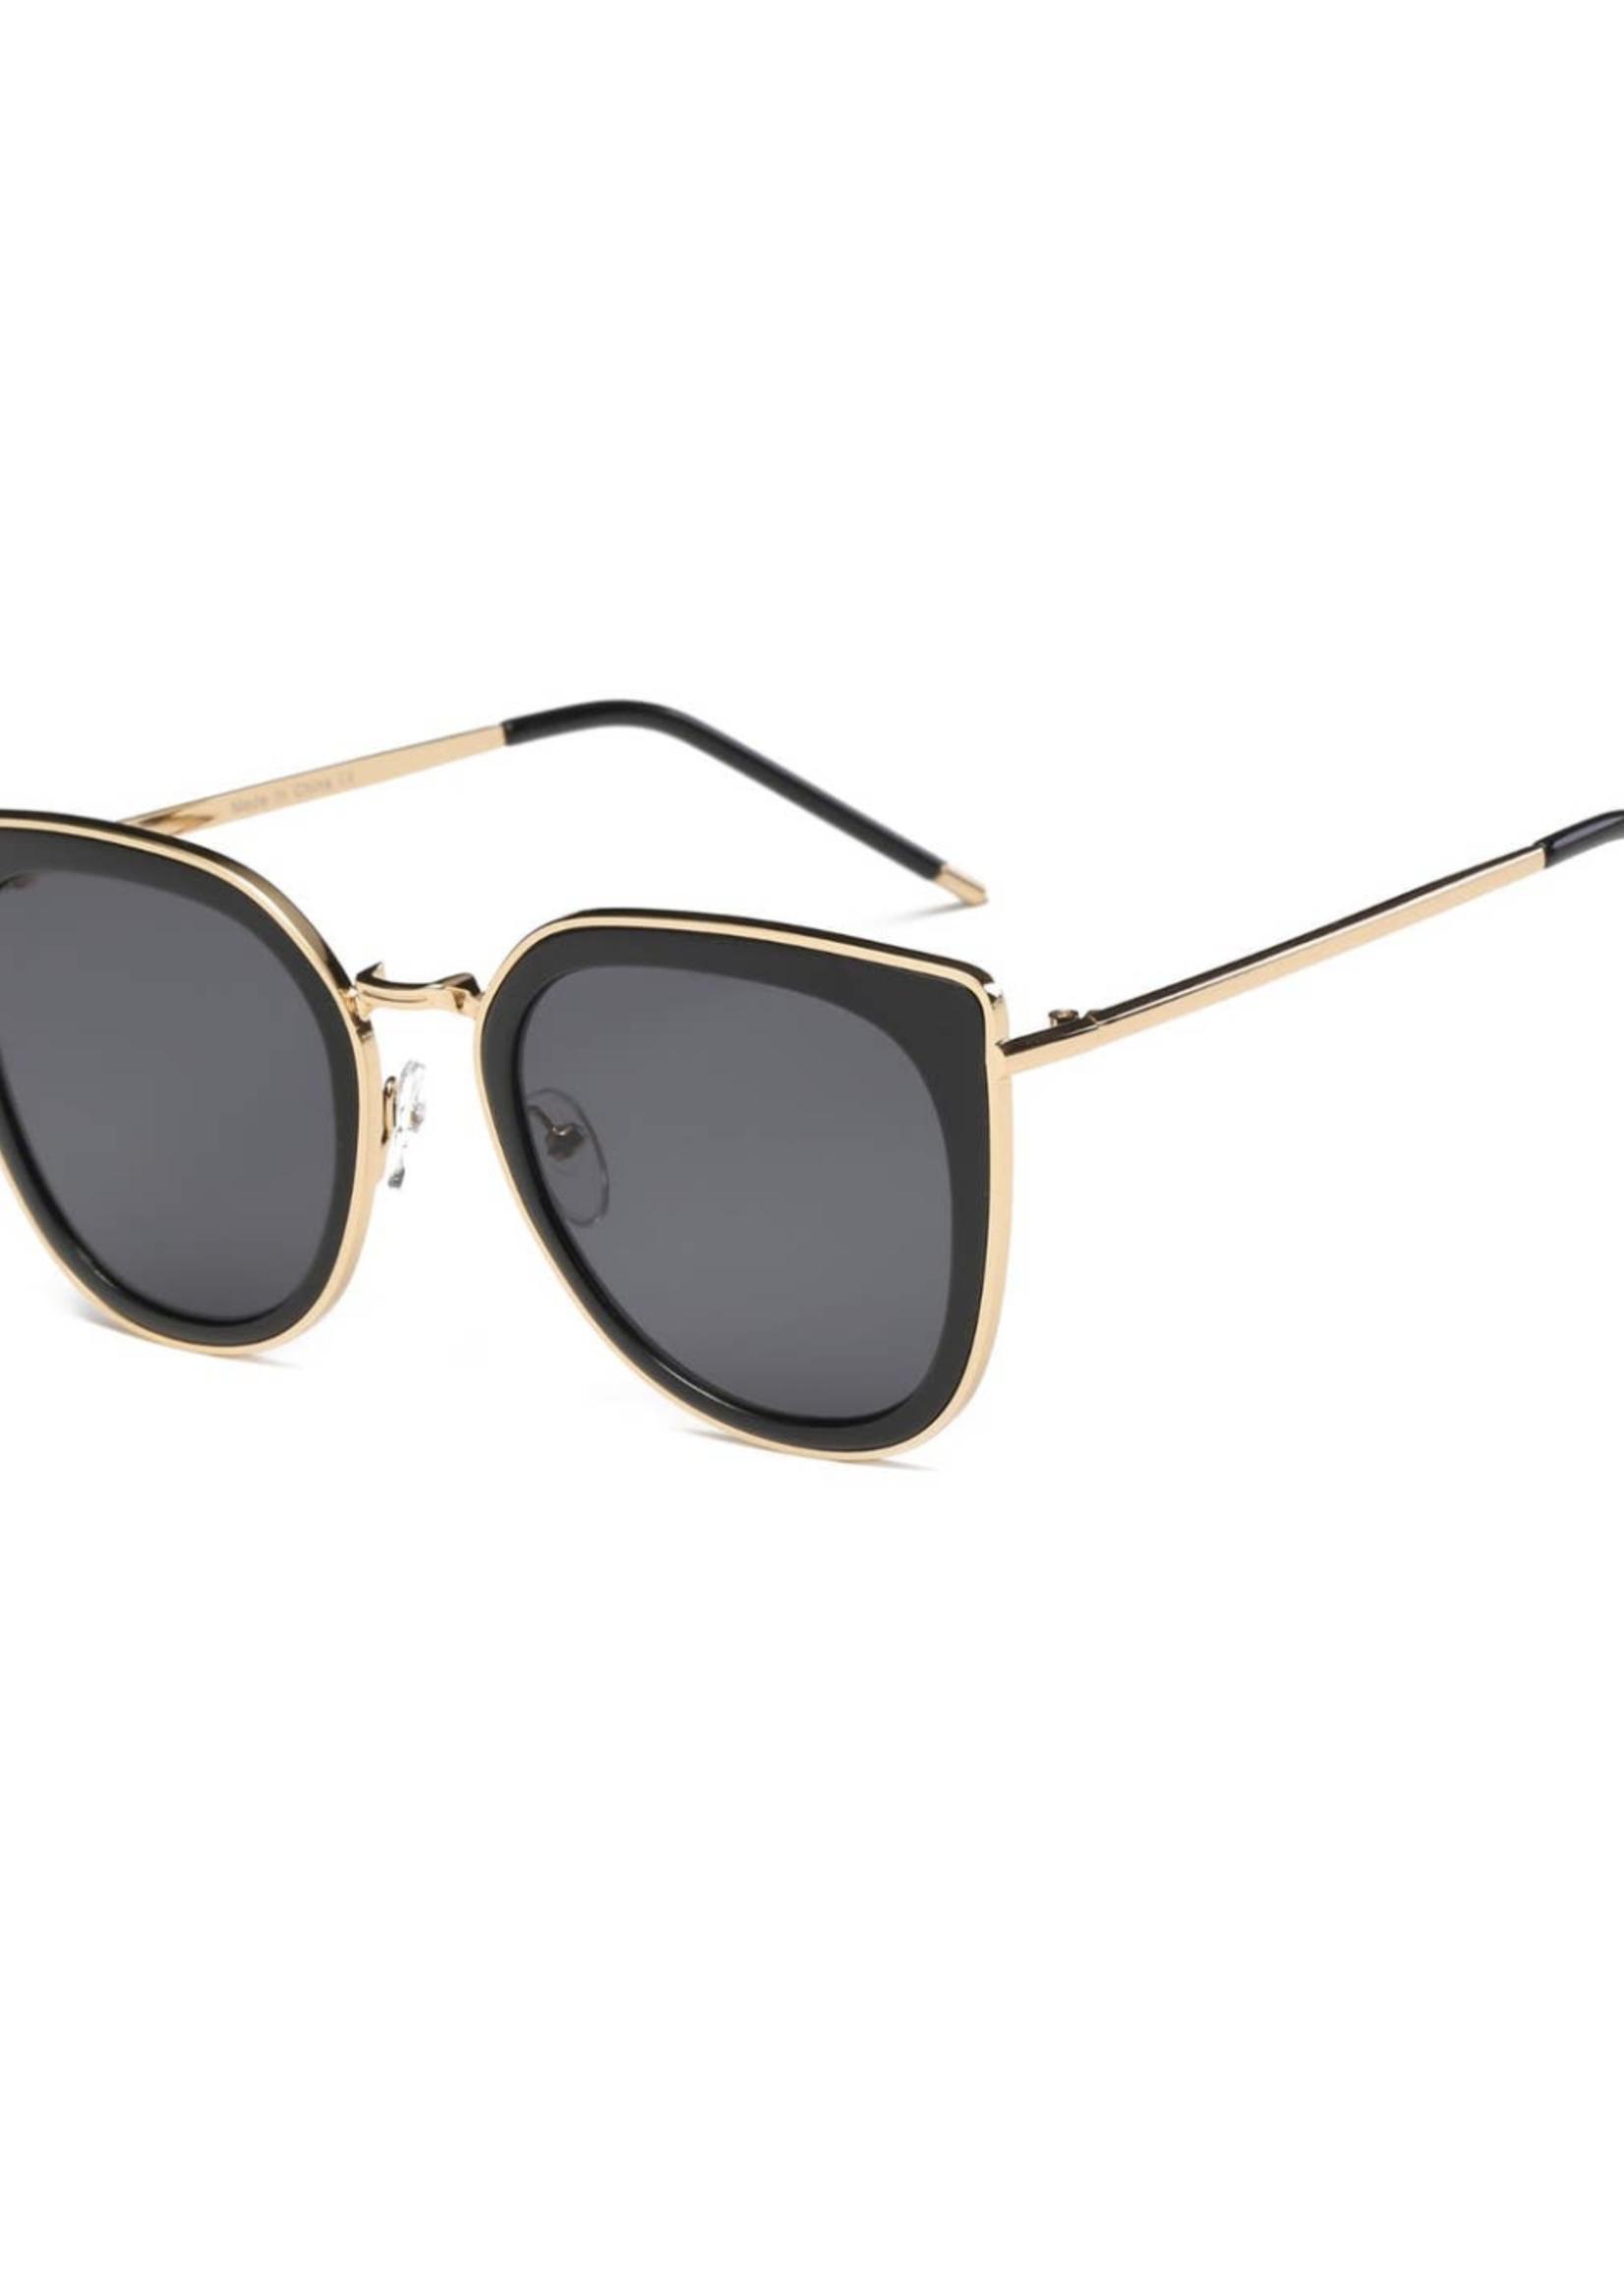 August Avenue Eyewear Manhattan   Metal Frame Sunglasses